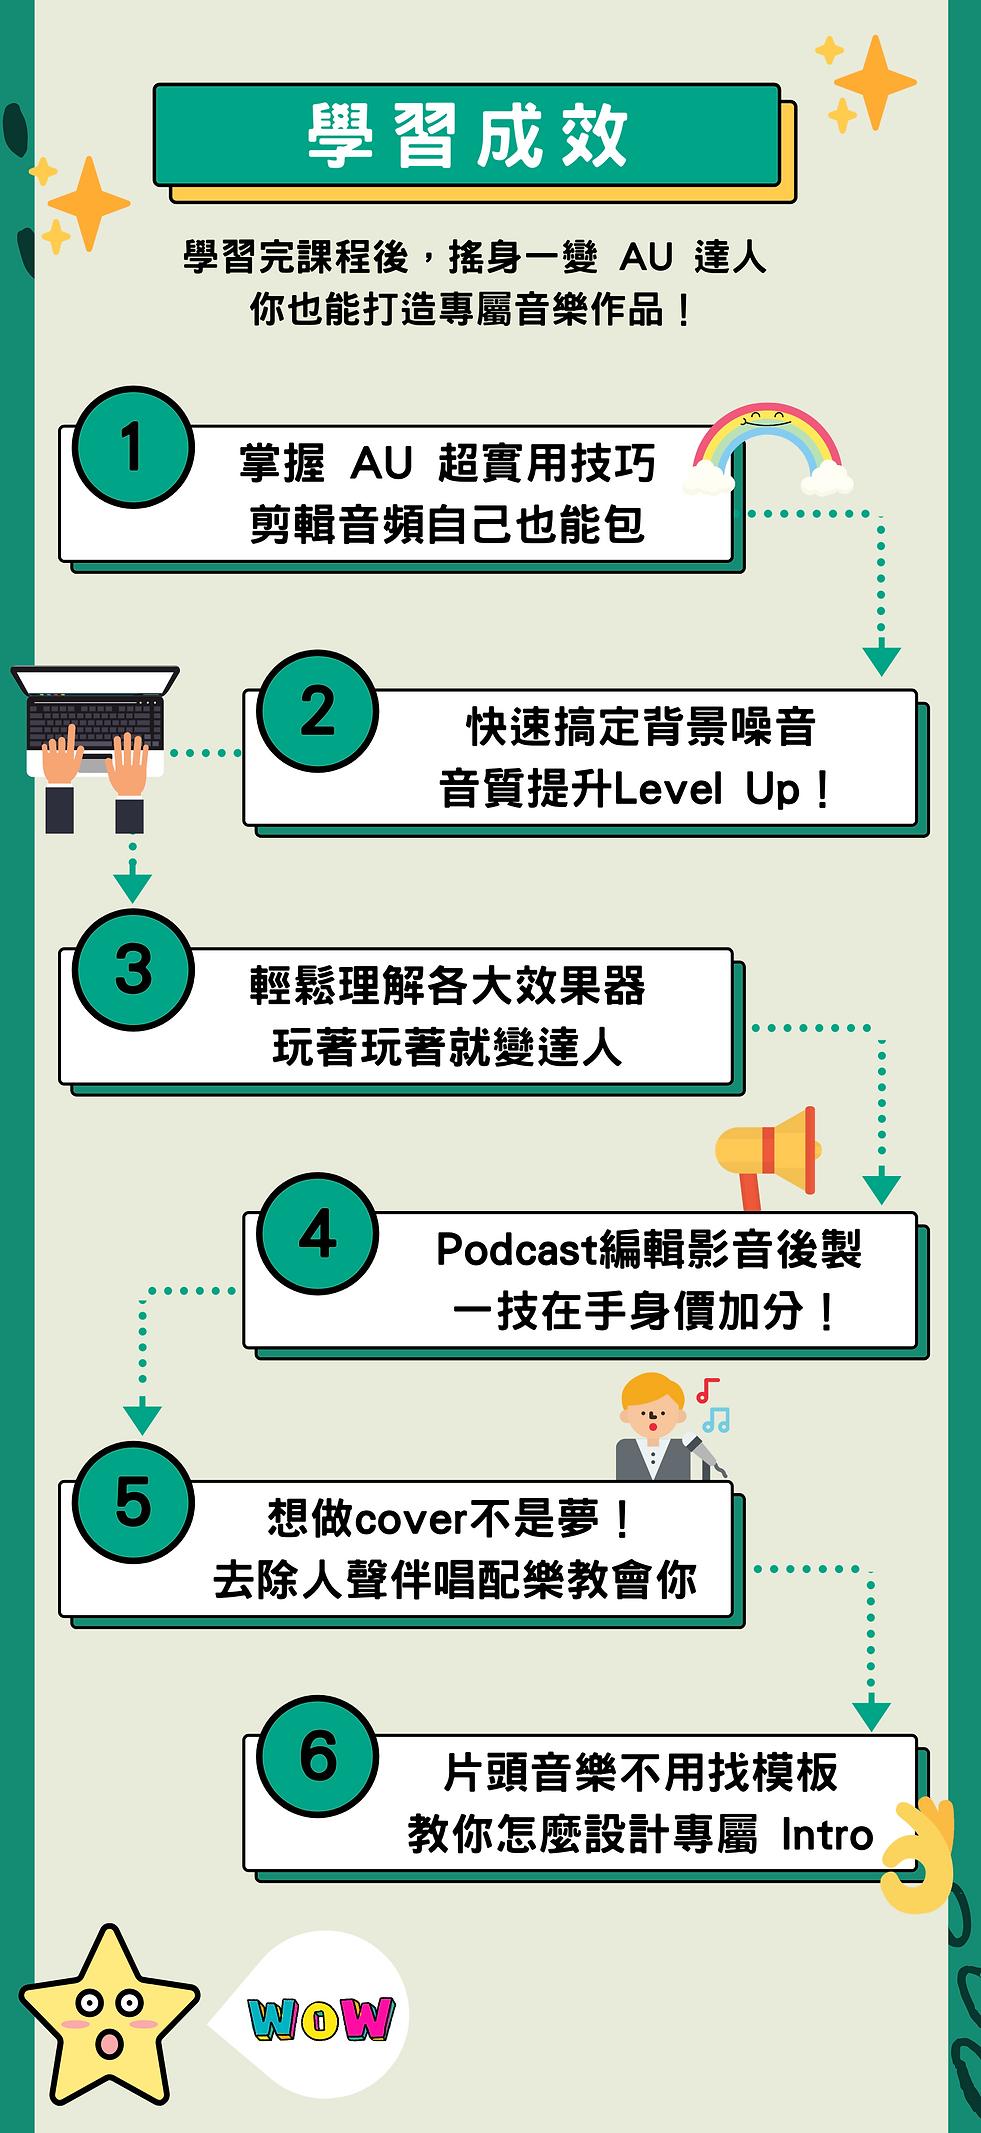 (N) 手機板- (5) 學習成效 - AU 新手攻略課程 (1).png